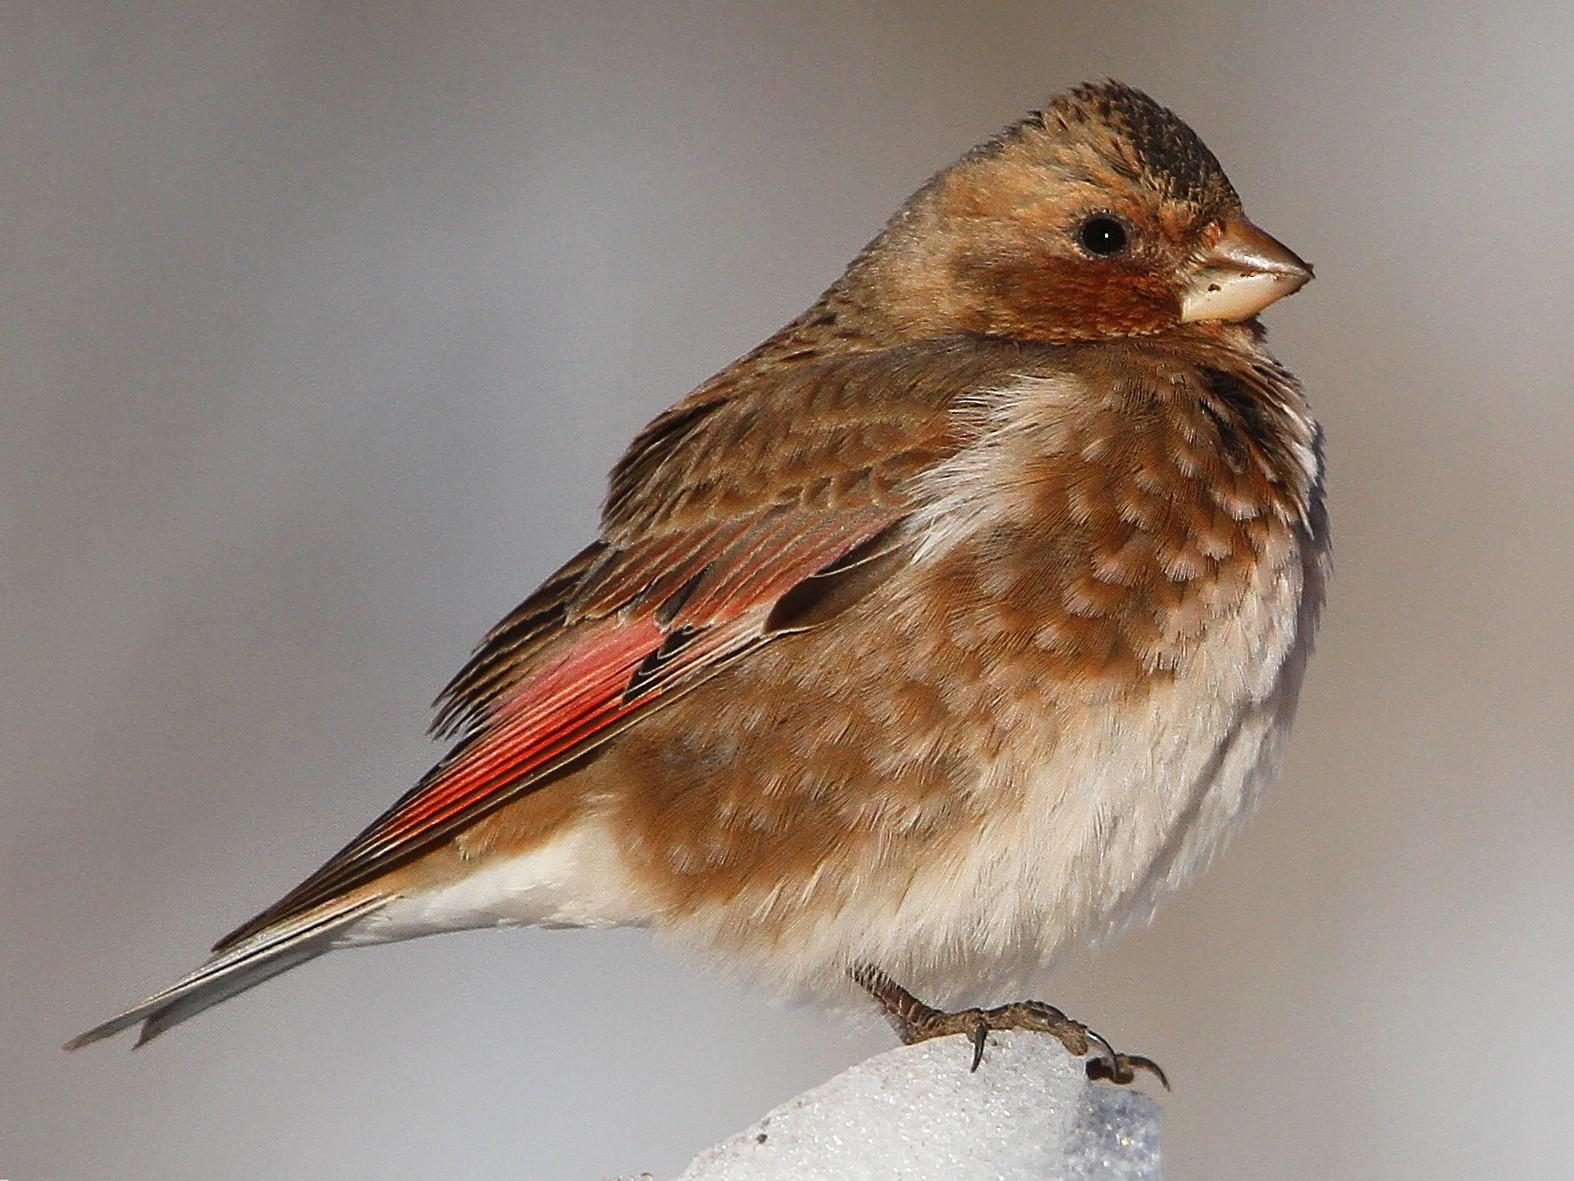 Crimson-winged Finch - Christoph Moning